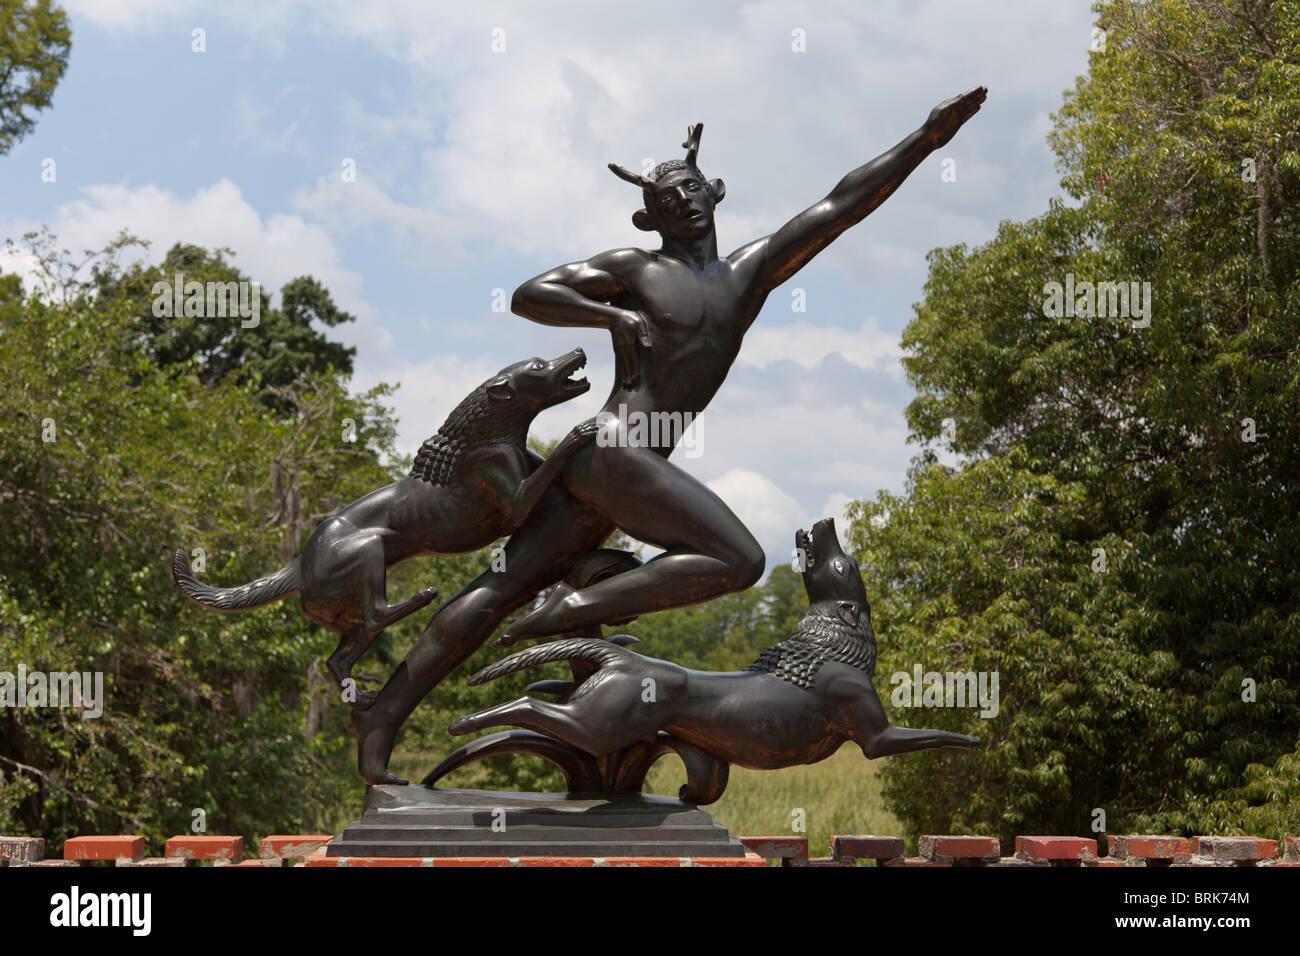 Actaeon By Paul Howard Manship In Brookgreen Gardens, South Carolina    Stock Image